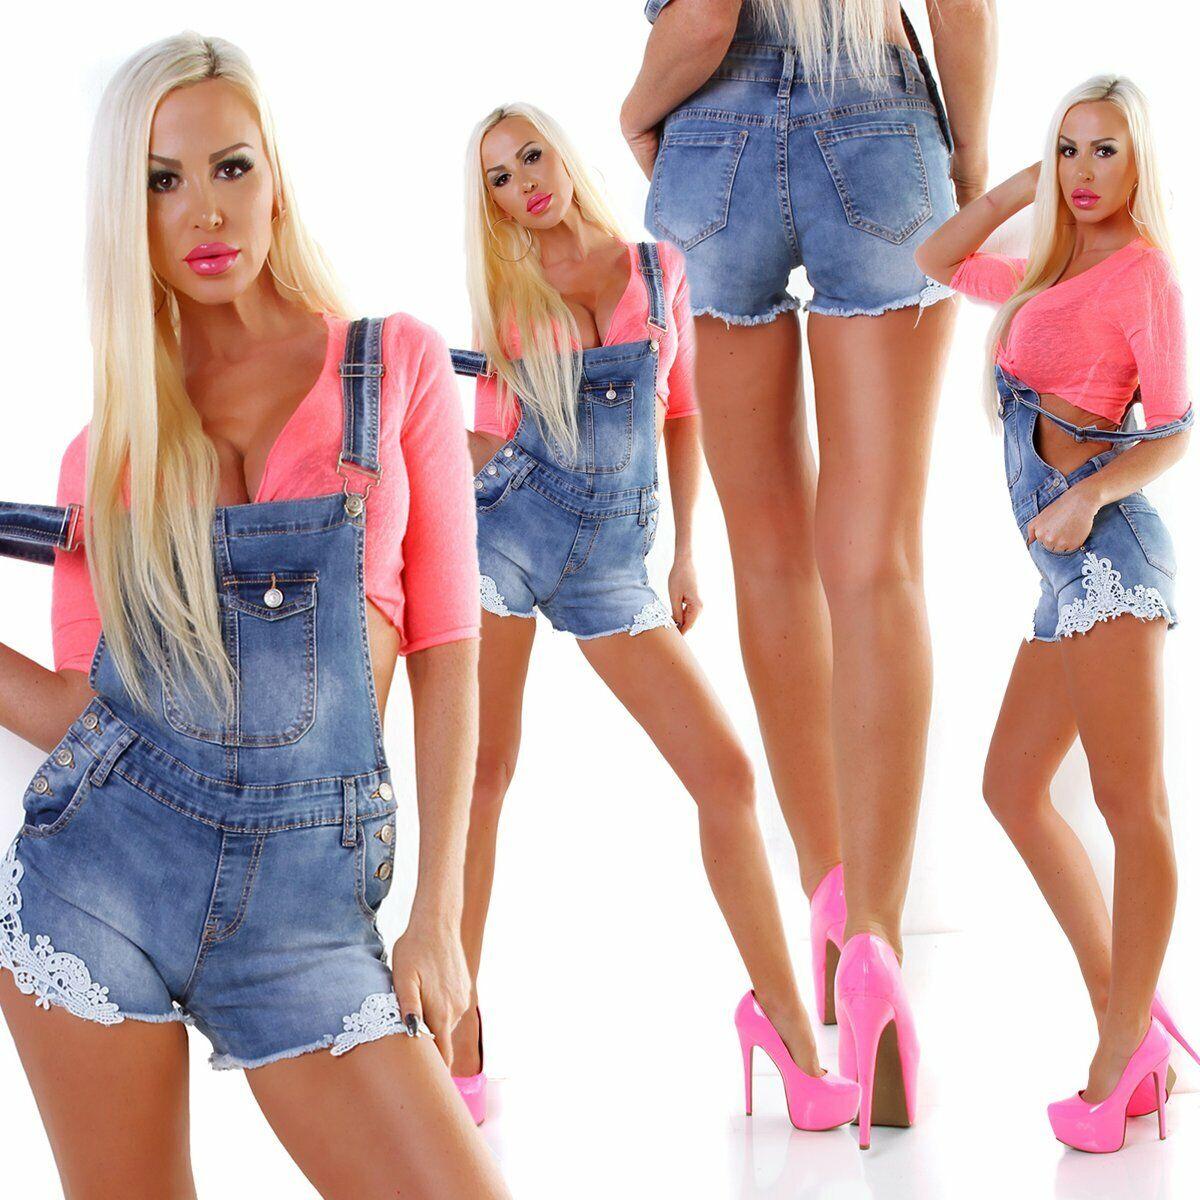 5383 Damen Latzjeans Latzshorts Hotpants Jeans Shorts kurze Hose Spitze Fransen